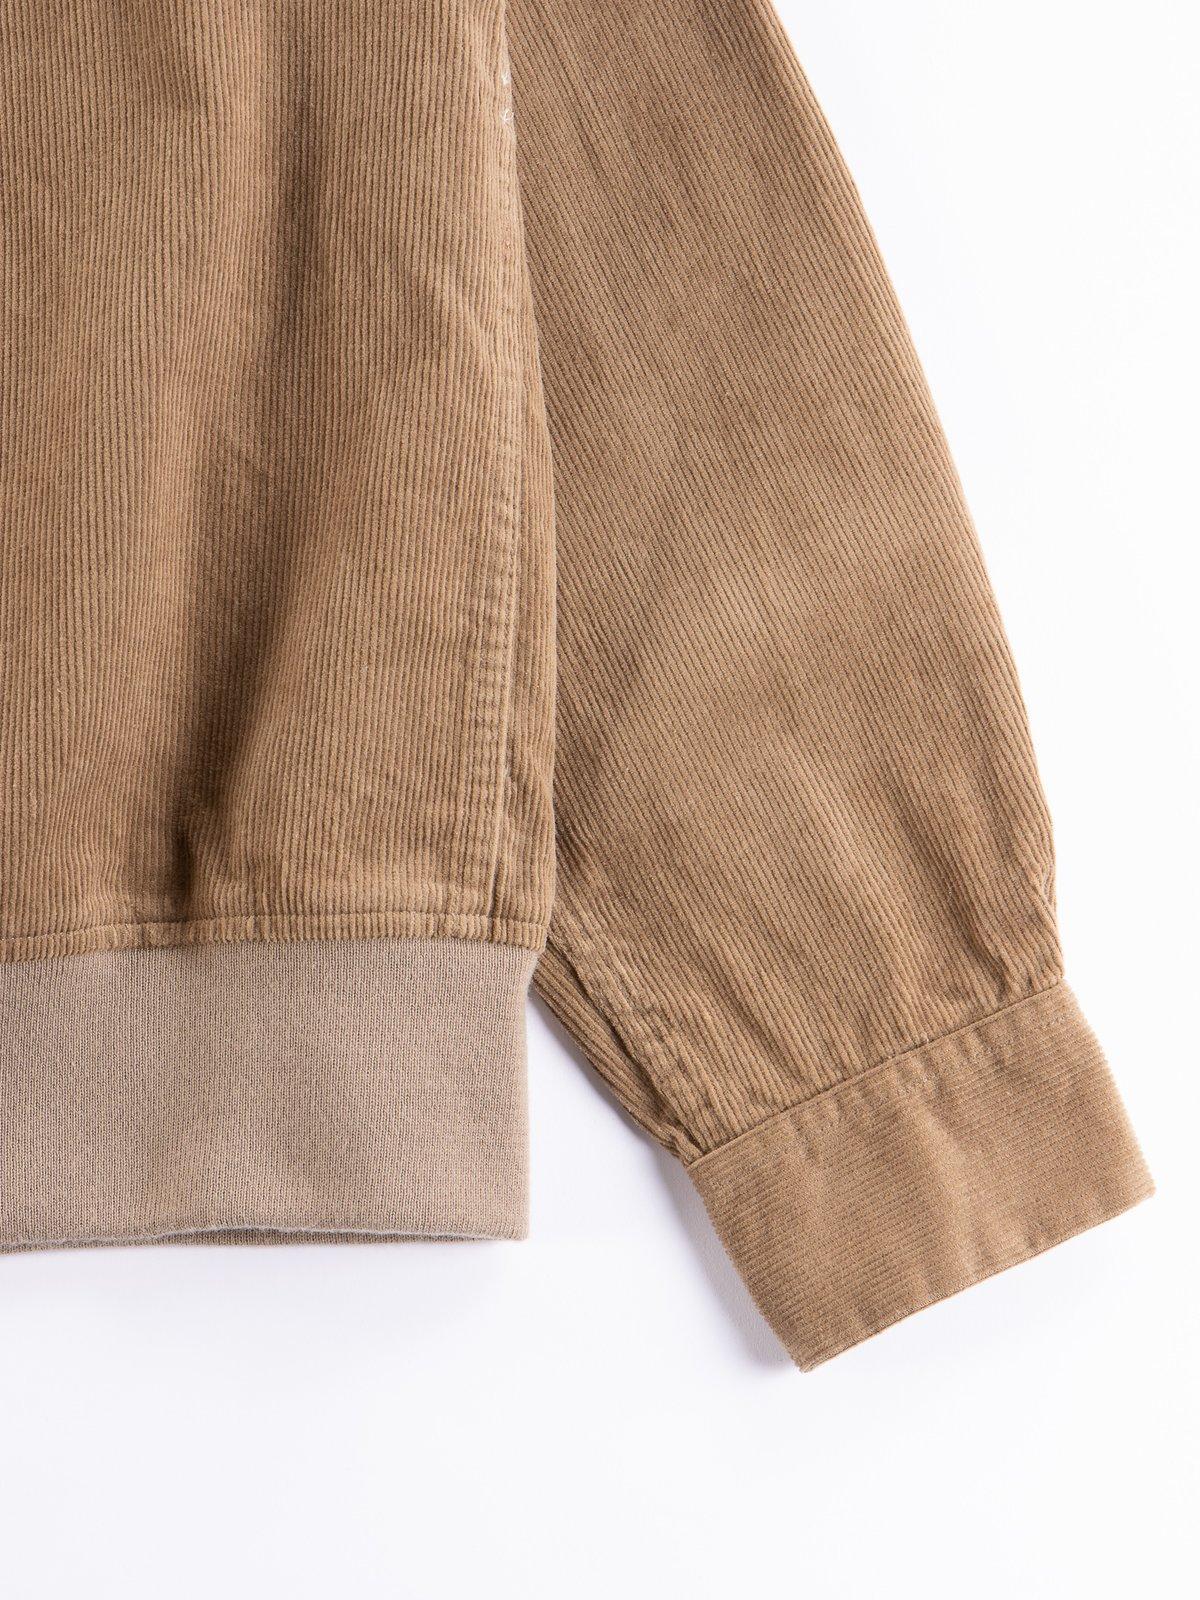 Khaki 14W Corduroy Classic Shirt - Image 4